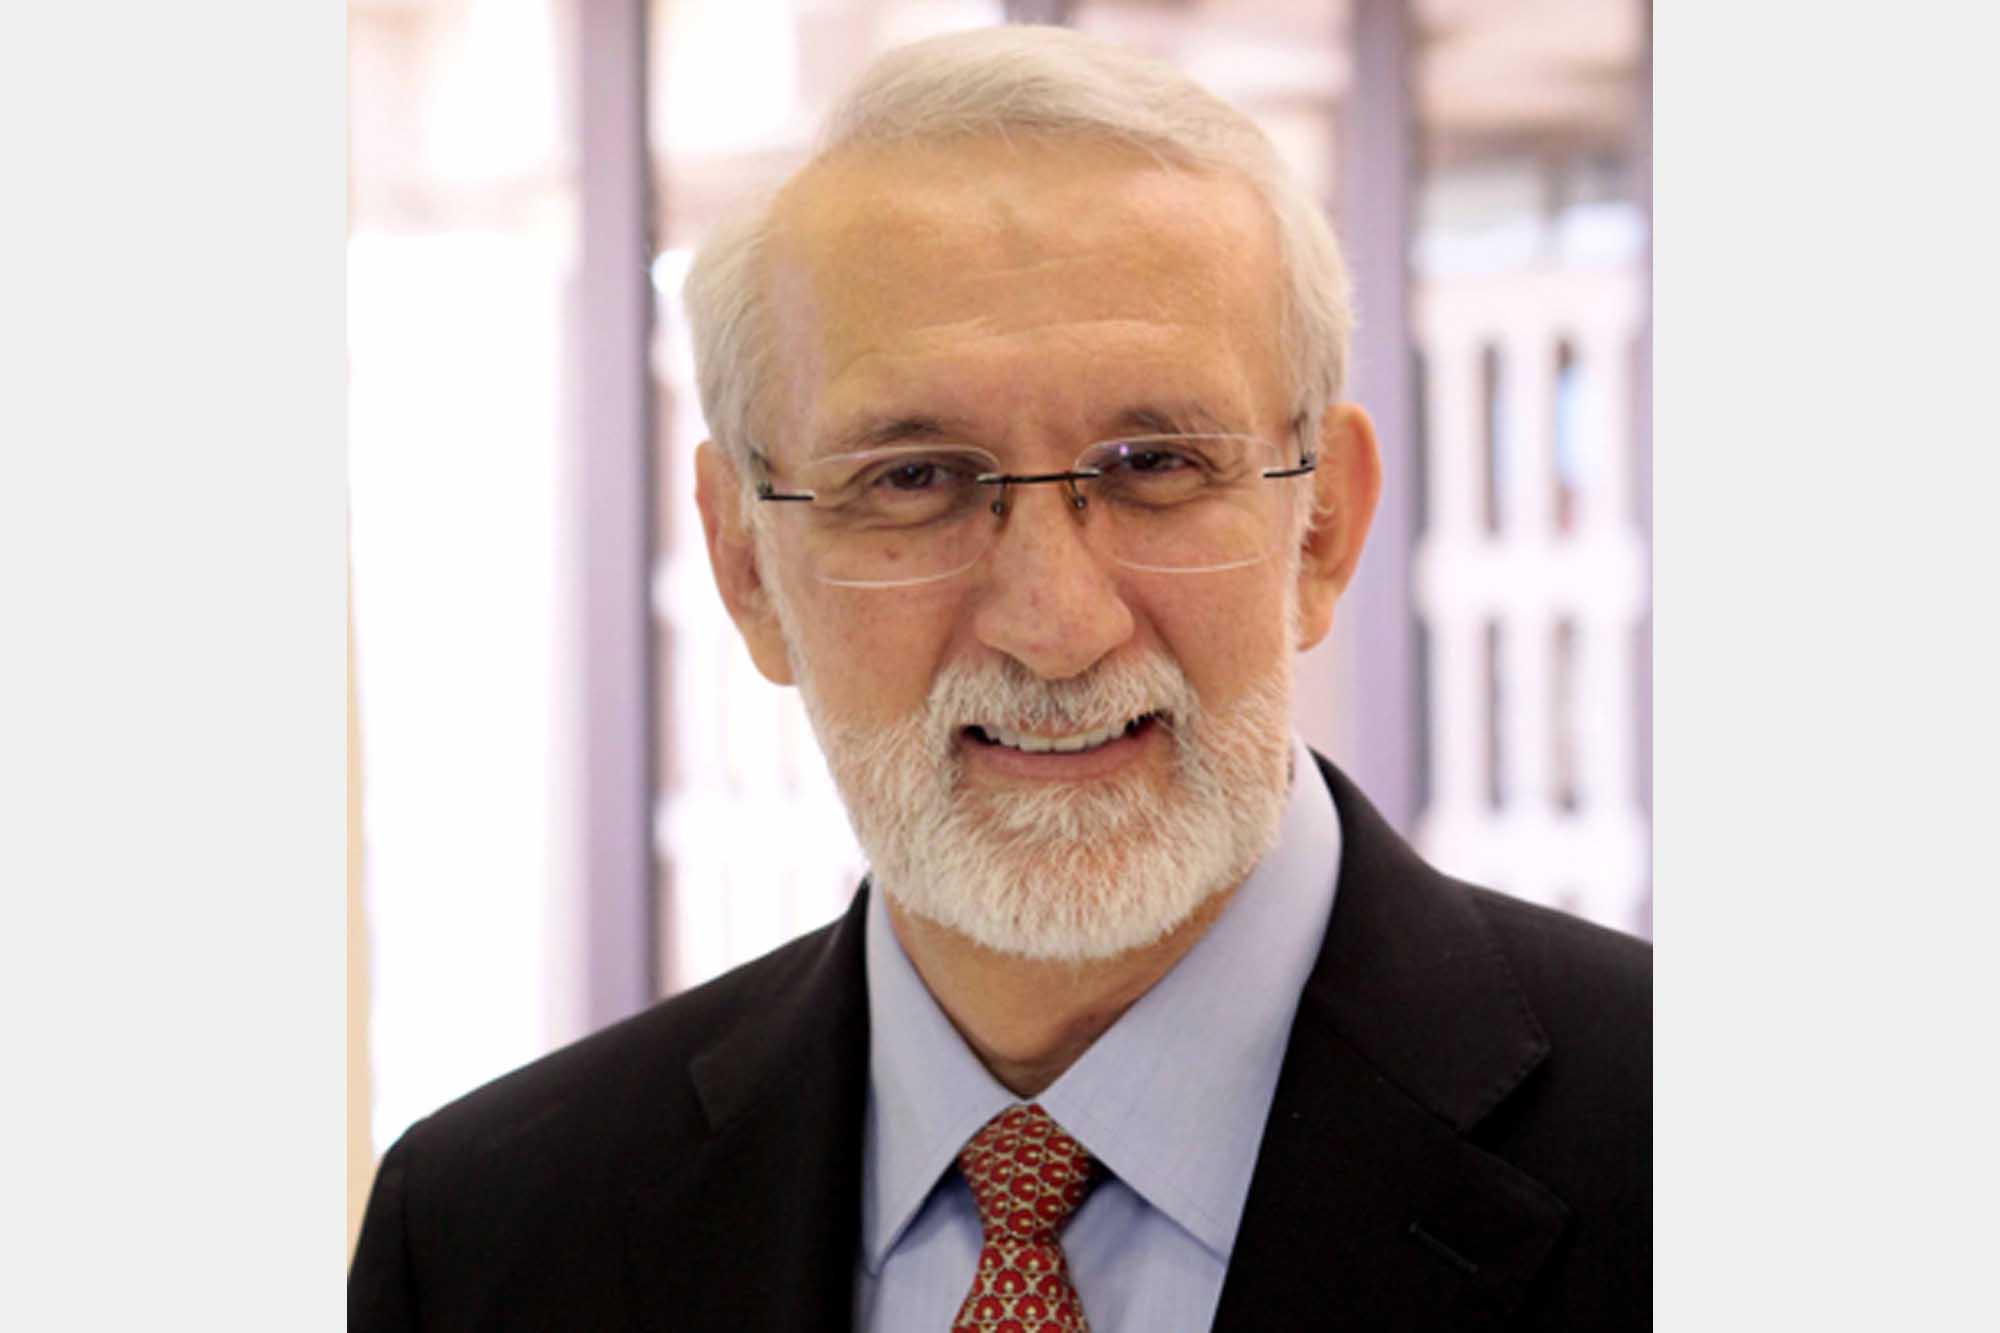 Dr. Sergio Aguilar Gaxiola 170920